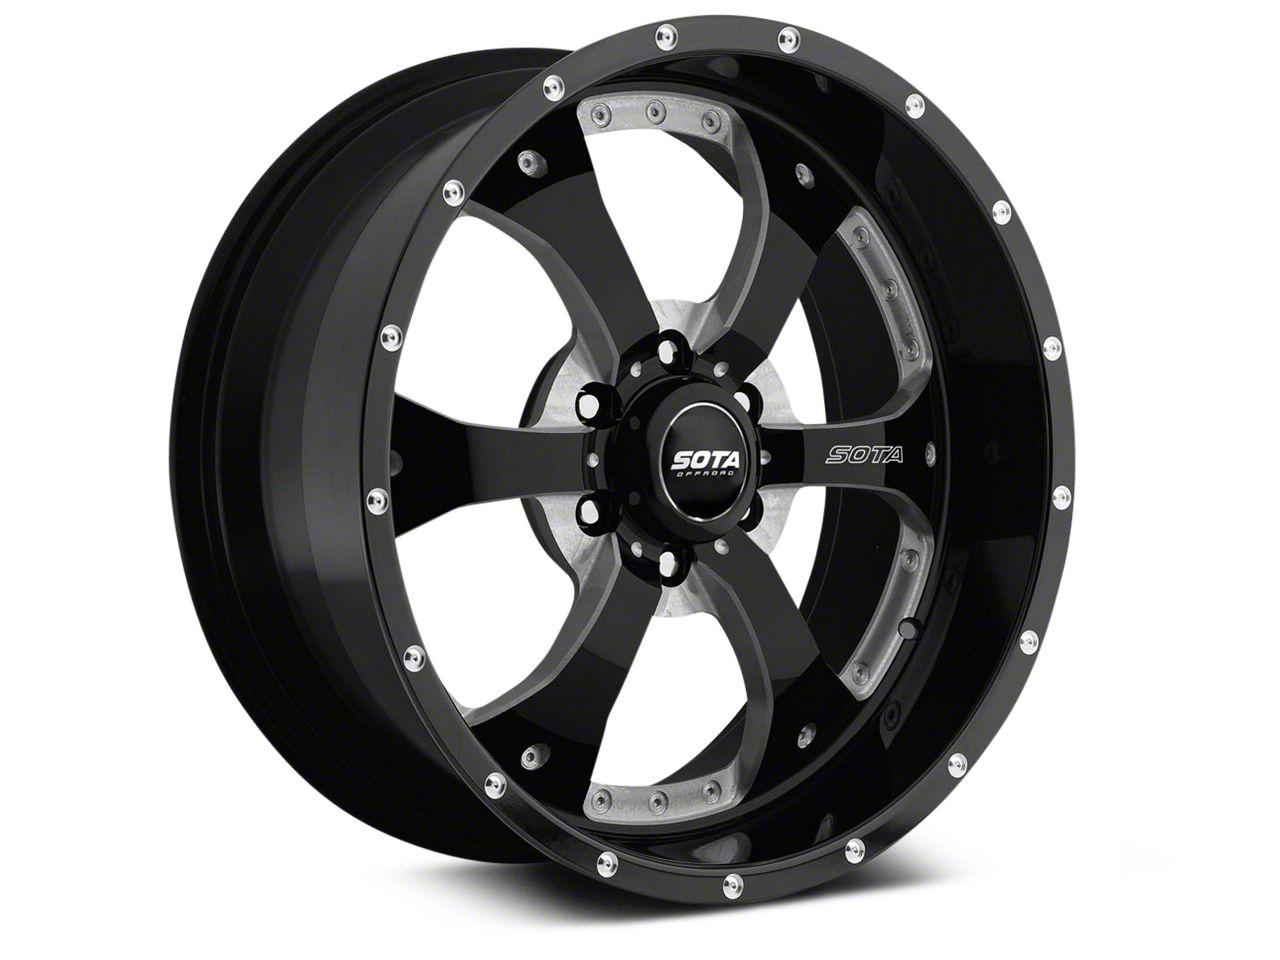 SOTA Off Road NOVAKANE Death Metal 6-Lug Wheel - 22x9.5 (07-18 Sierra 1500)